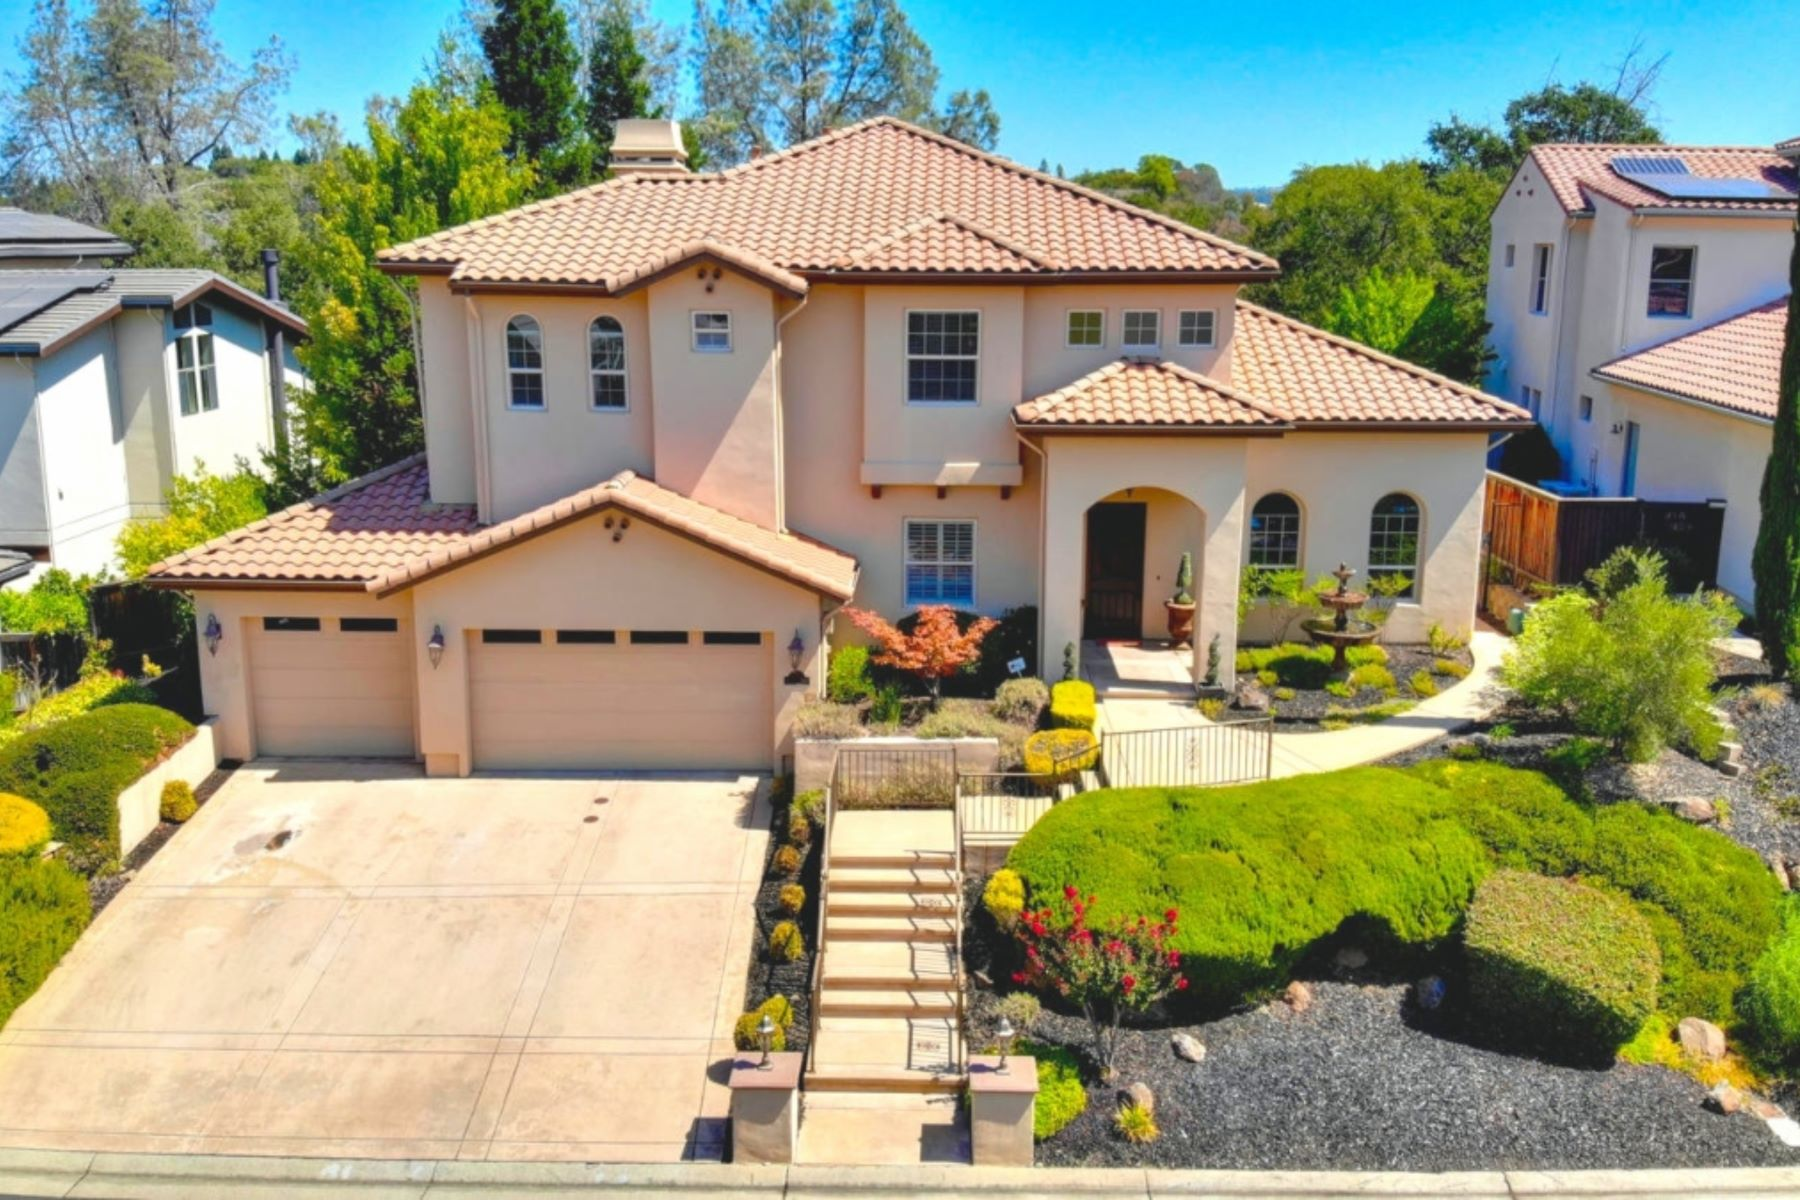 Single Family Homes for Sale at 5025 Coronado Dr. El Dorado Hills 5025 Coronado Dr El Dorado Hills, California 95762 United States